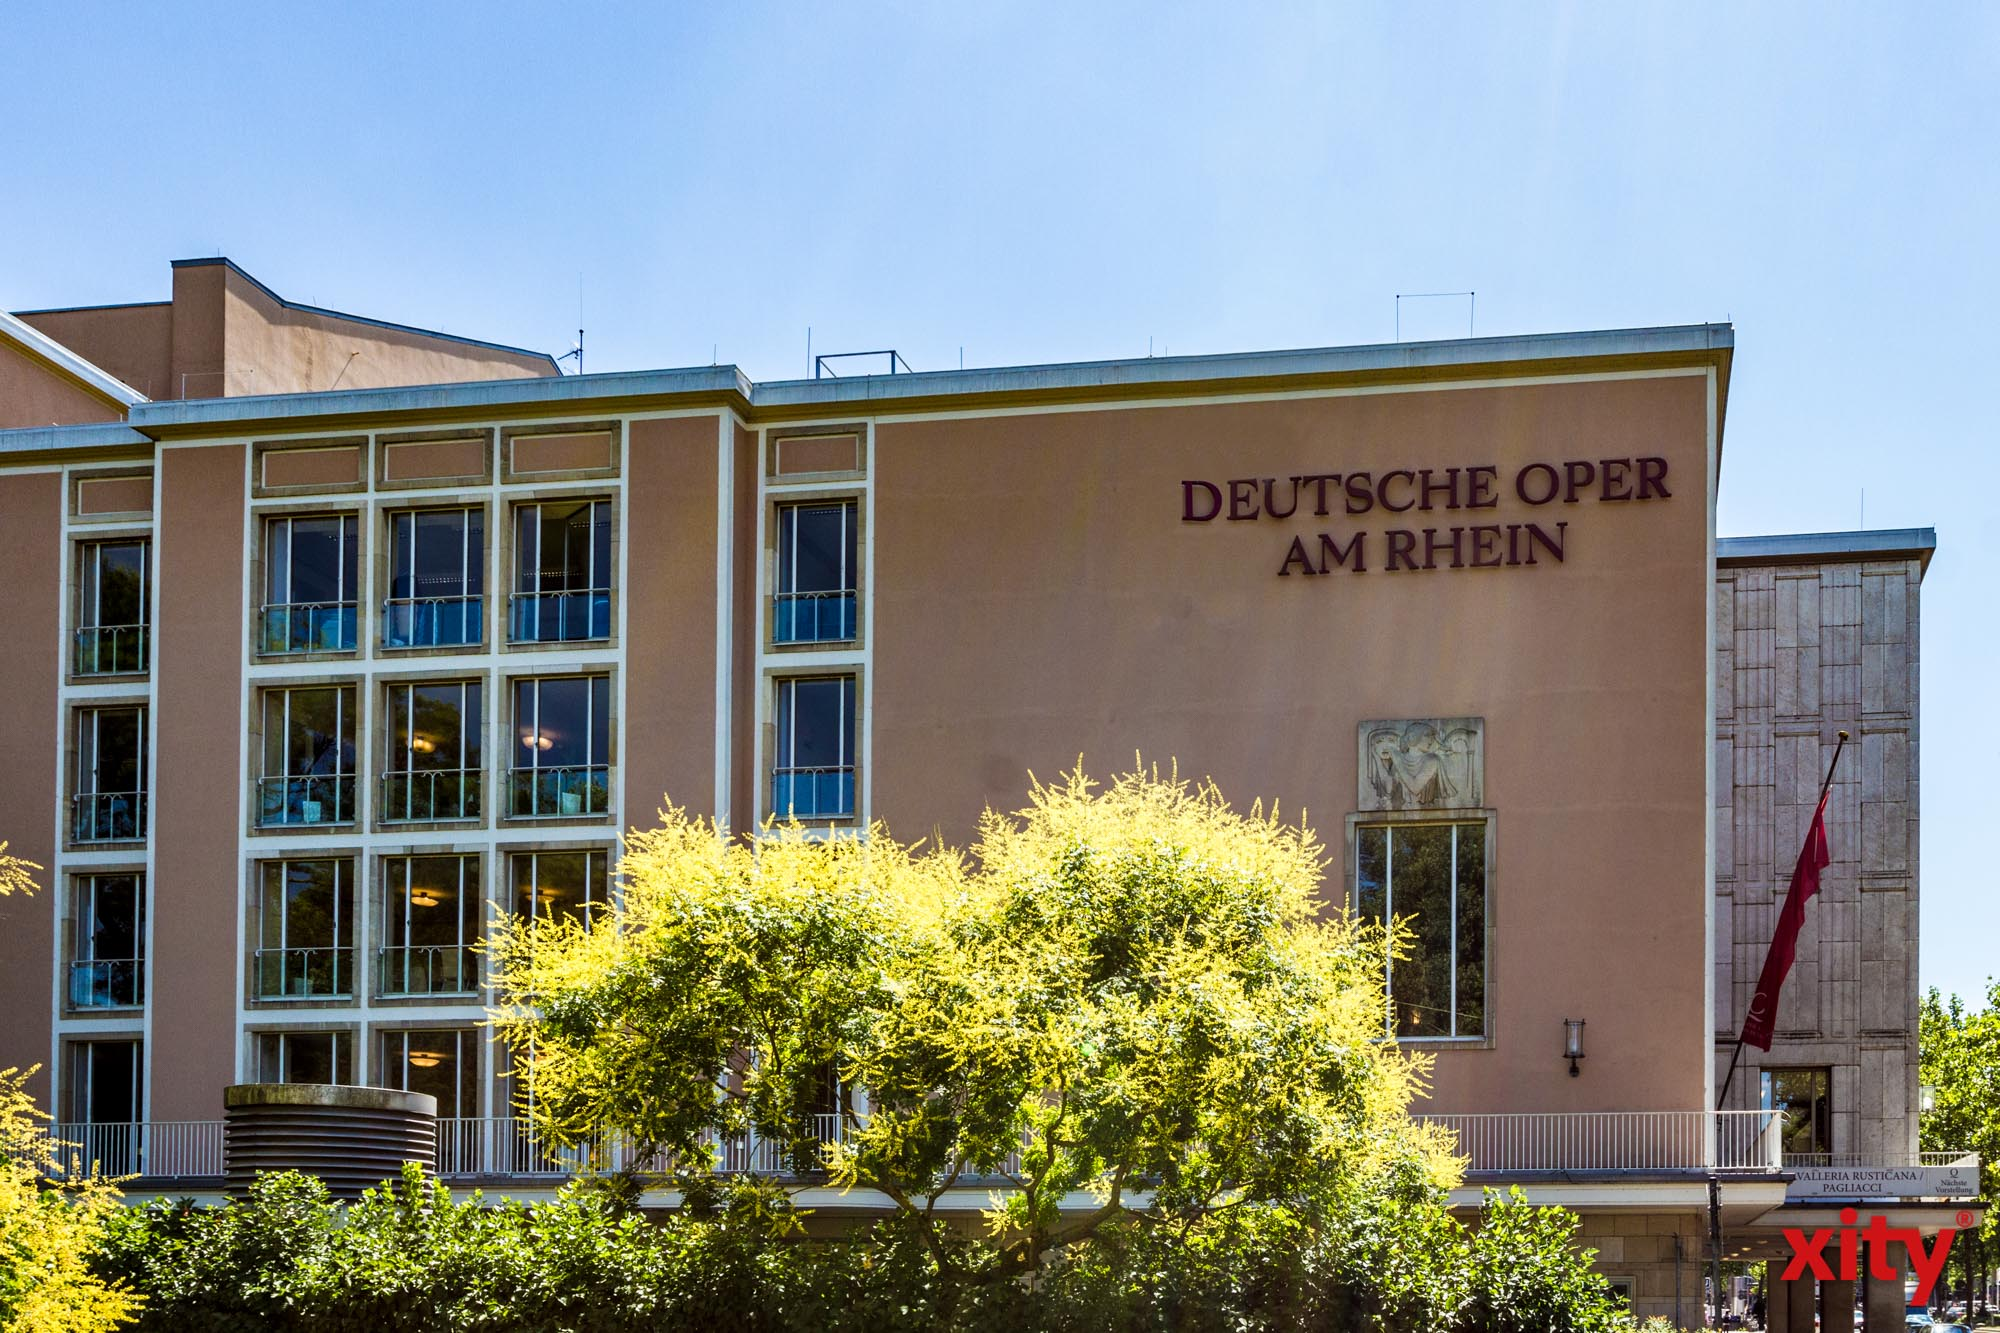 Digitales Osterferienprojekt der Oper am Rhein